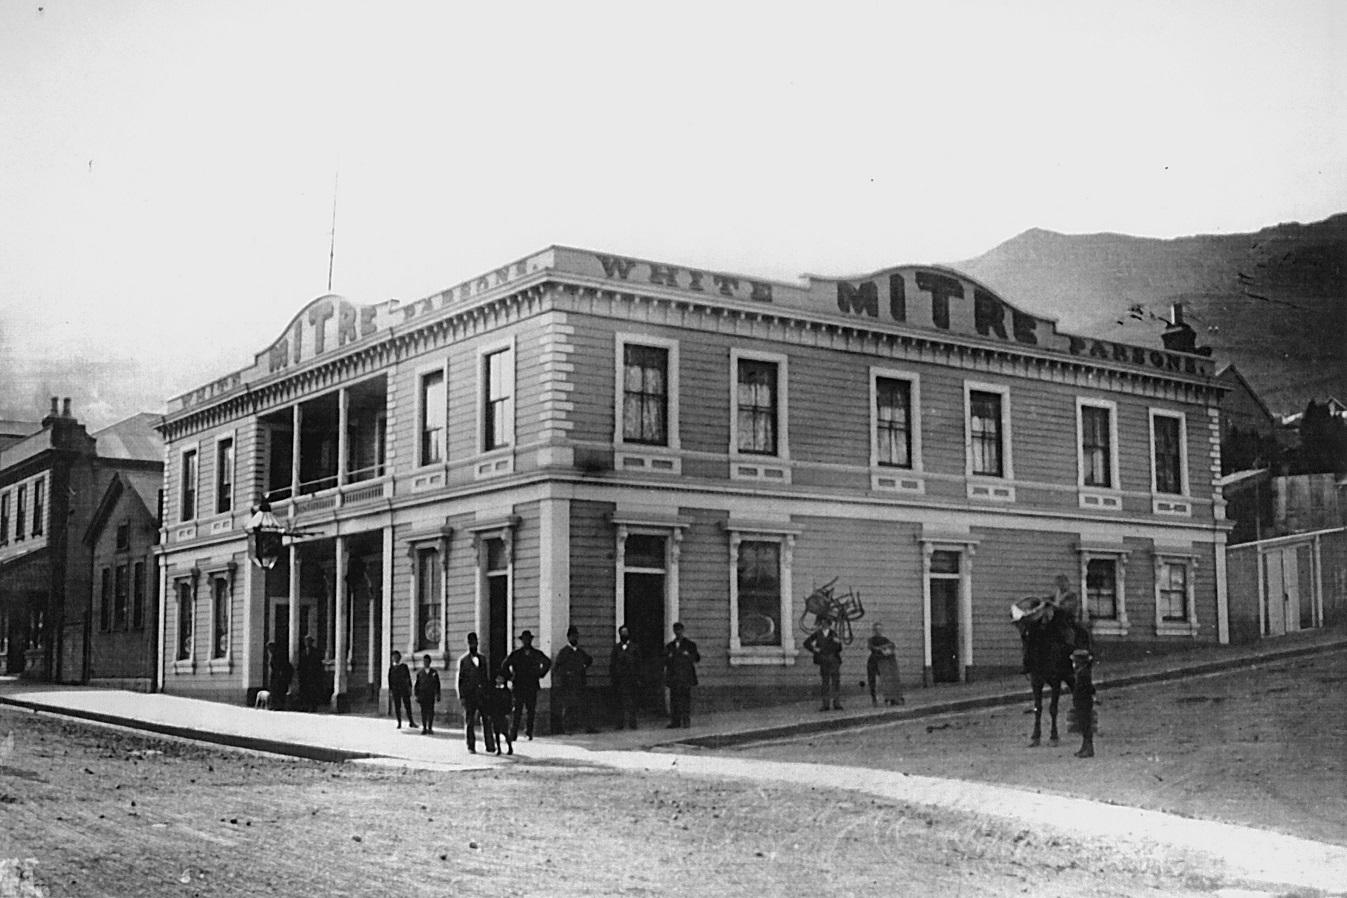 Mitre Hotel, 1894